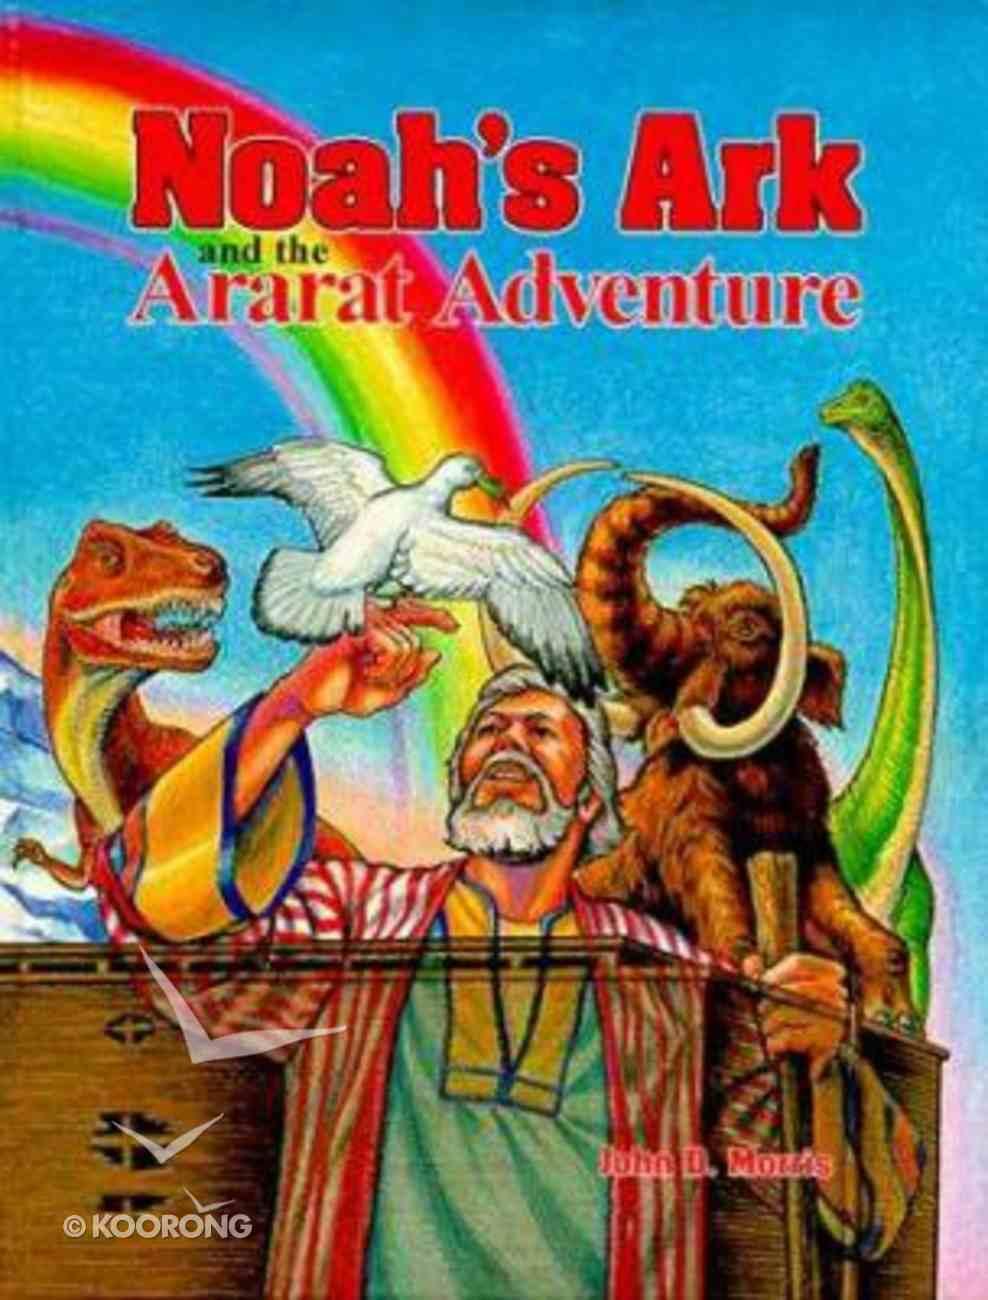 Noah's Ark and the Ararat Adventure Hardback